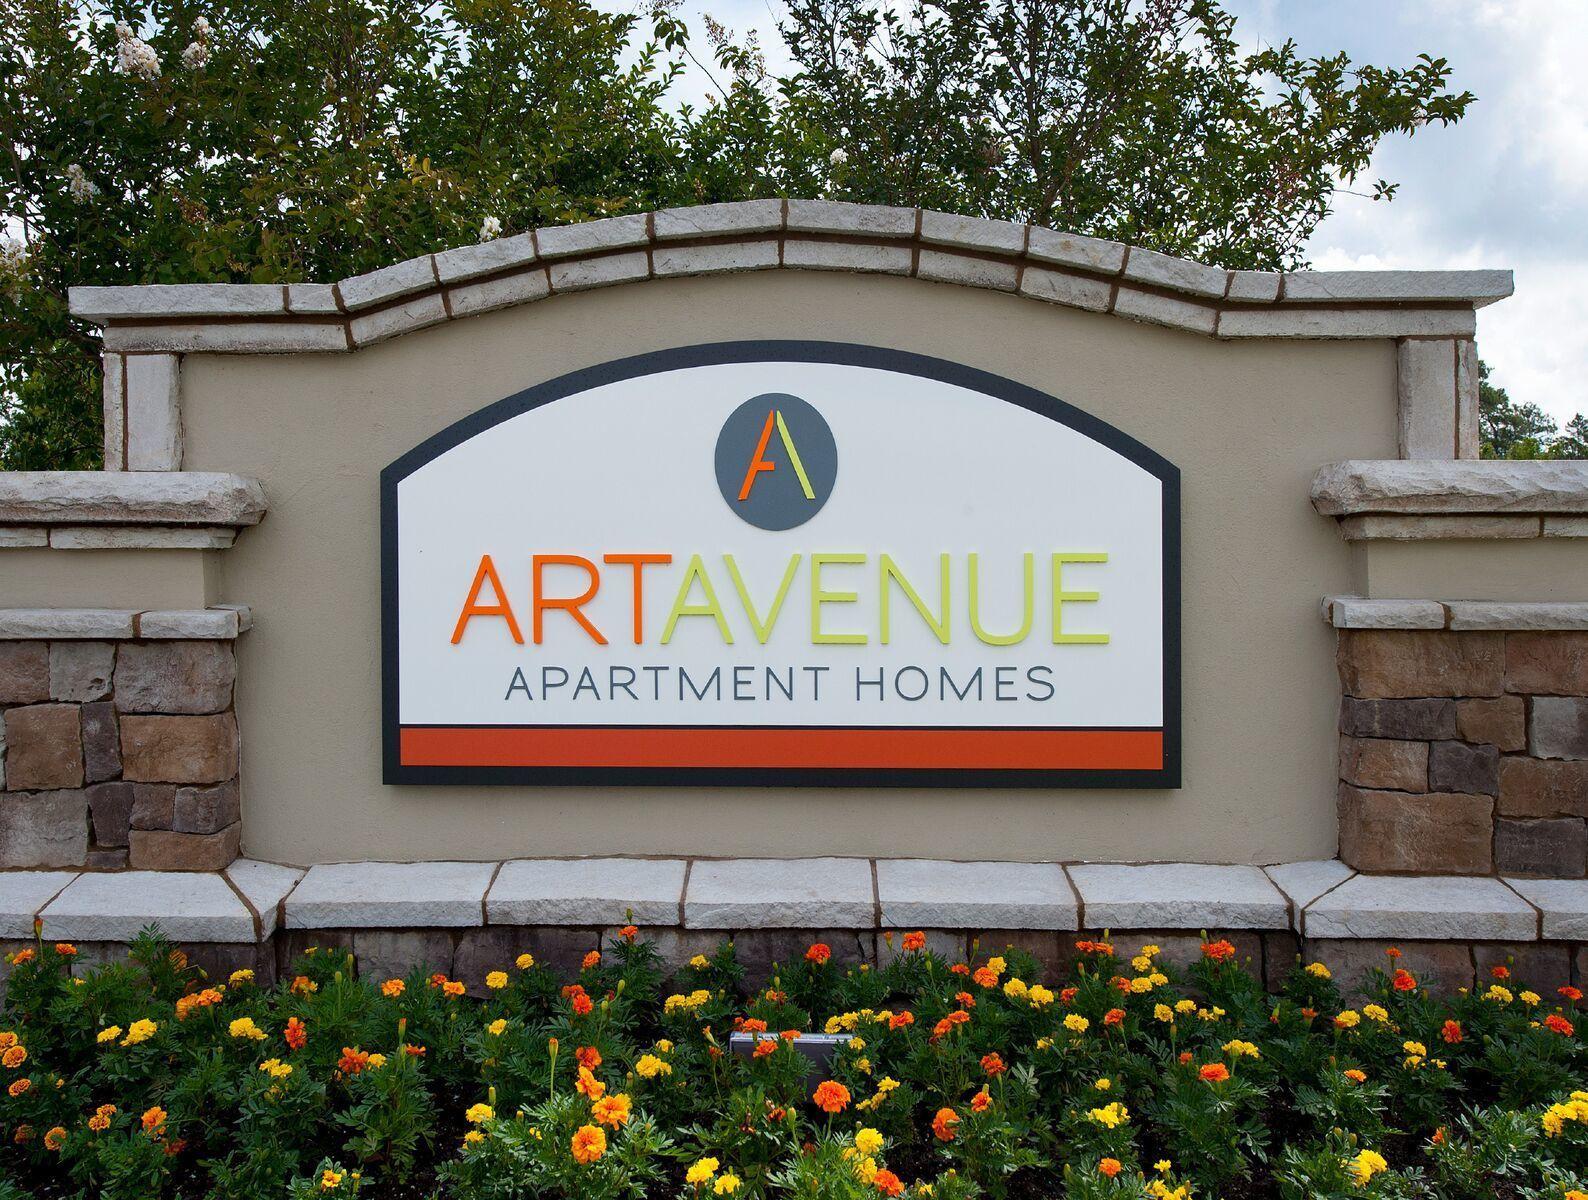 Art Avenue Apartments